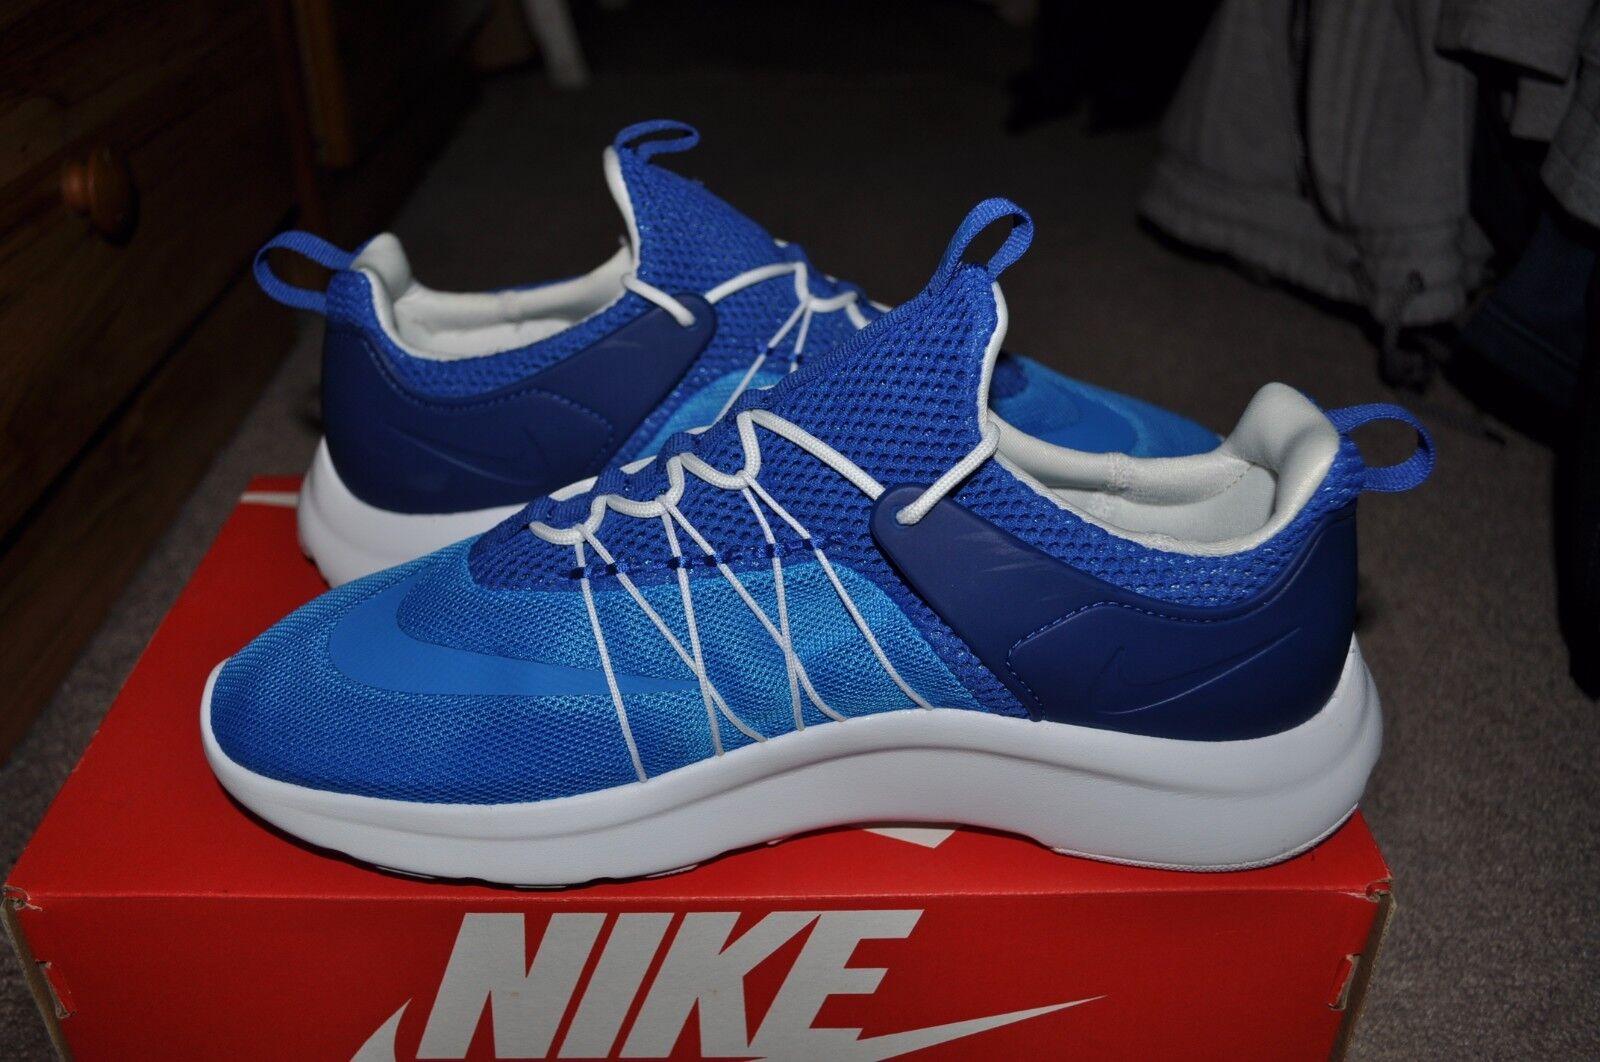 Nike darwin / foto blu - bianco - gioco la dimensione reale